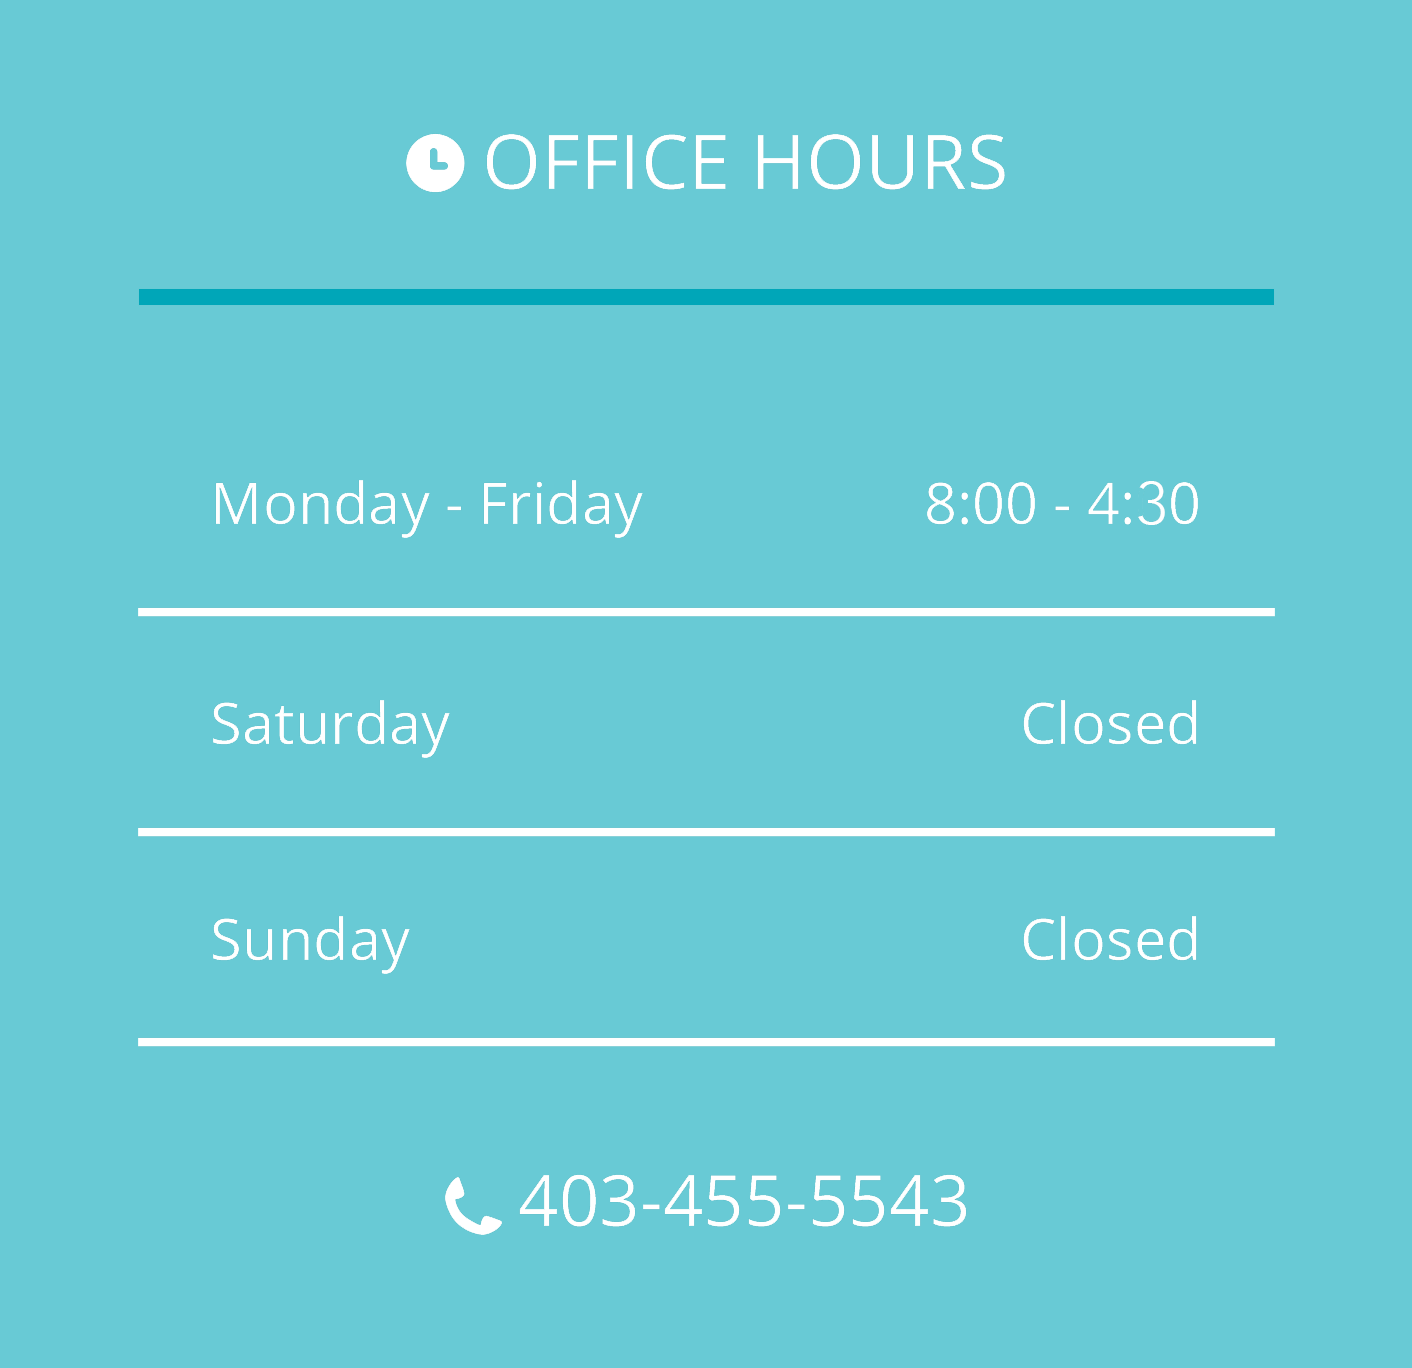 Distintive dental hours